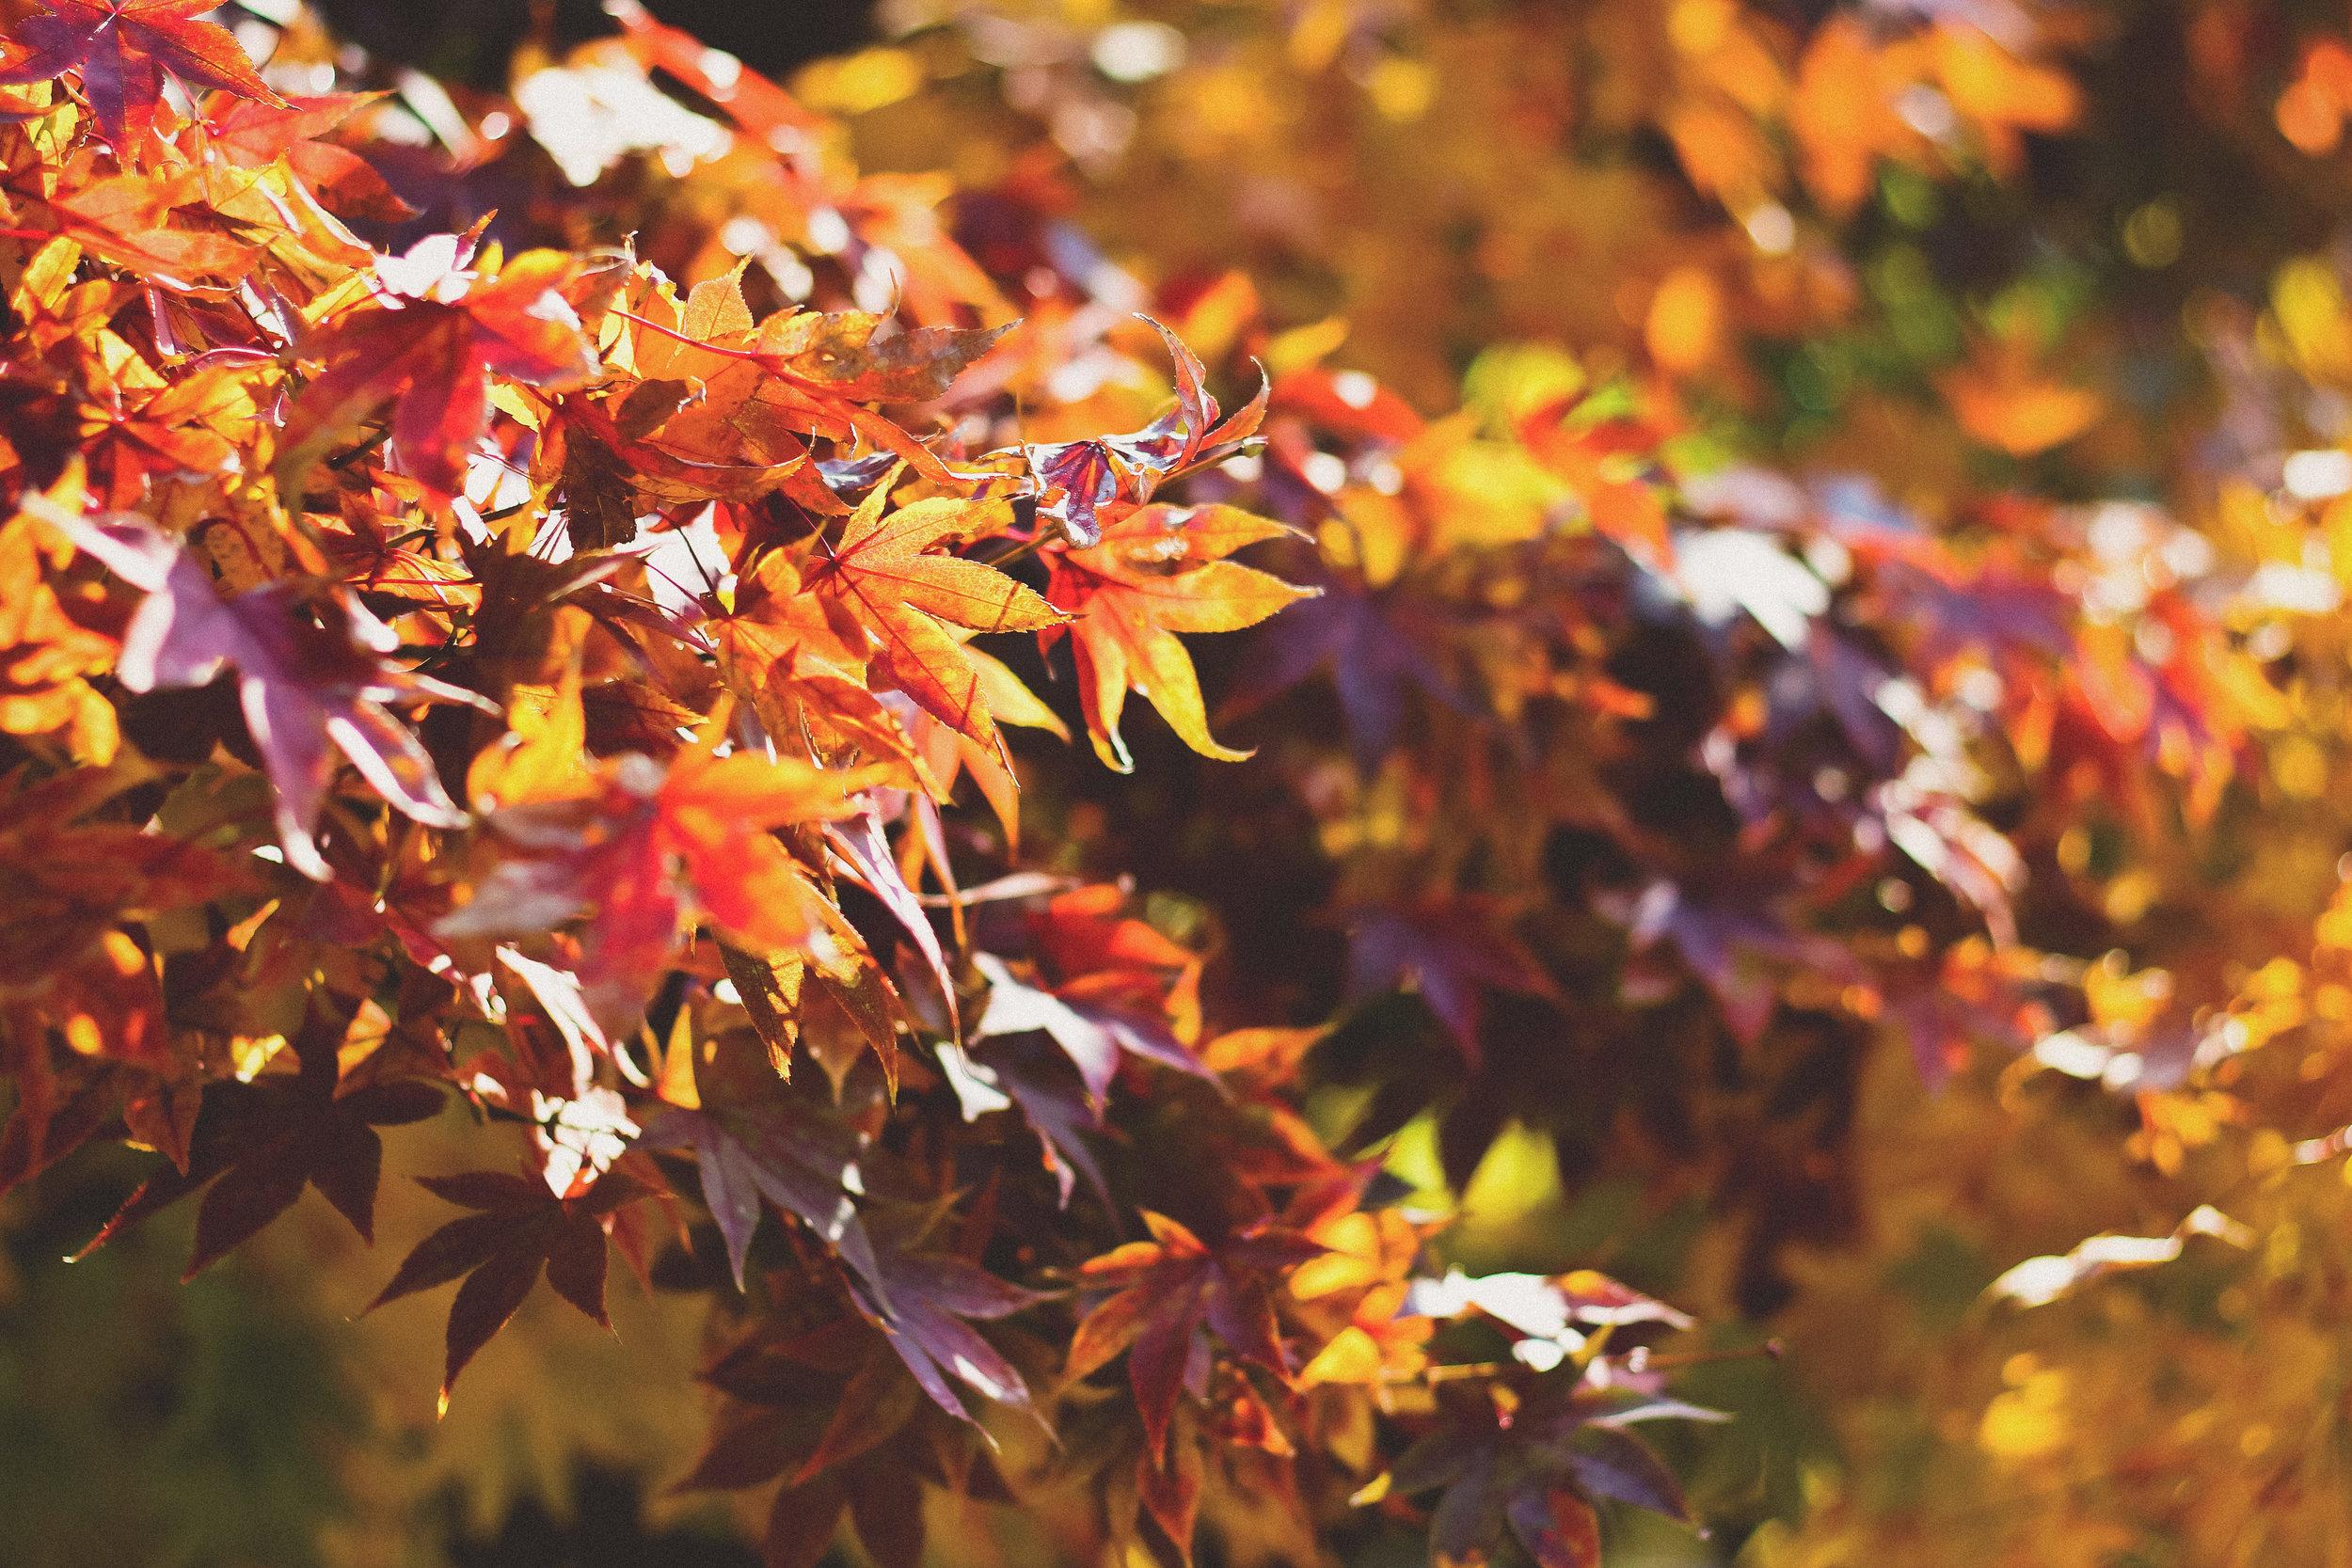 Season of mists, mellow fruitfulness and school open days. Image credit: Unsplash